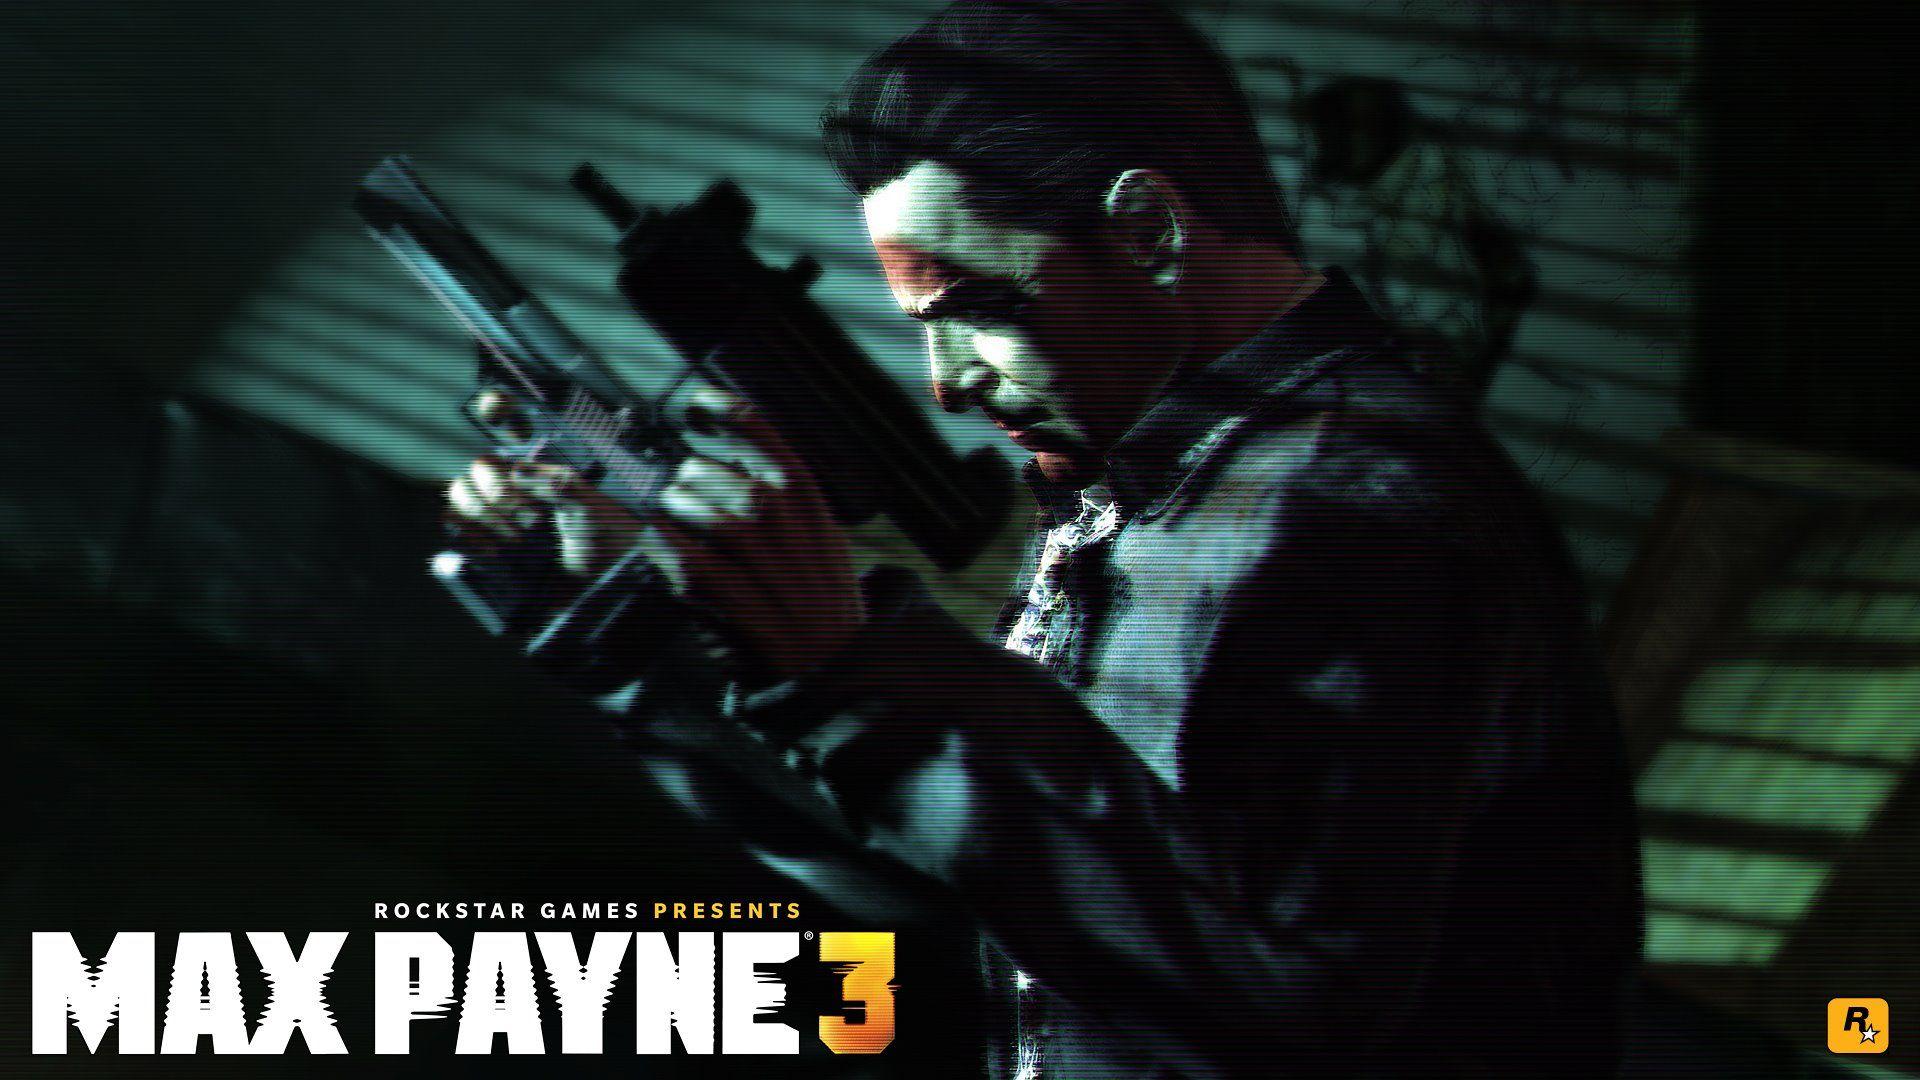 Wallpaper Hd Max Payne 3 Pc Playstation 3 Xbox 360 Rockstar